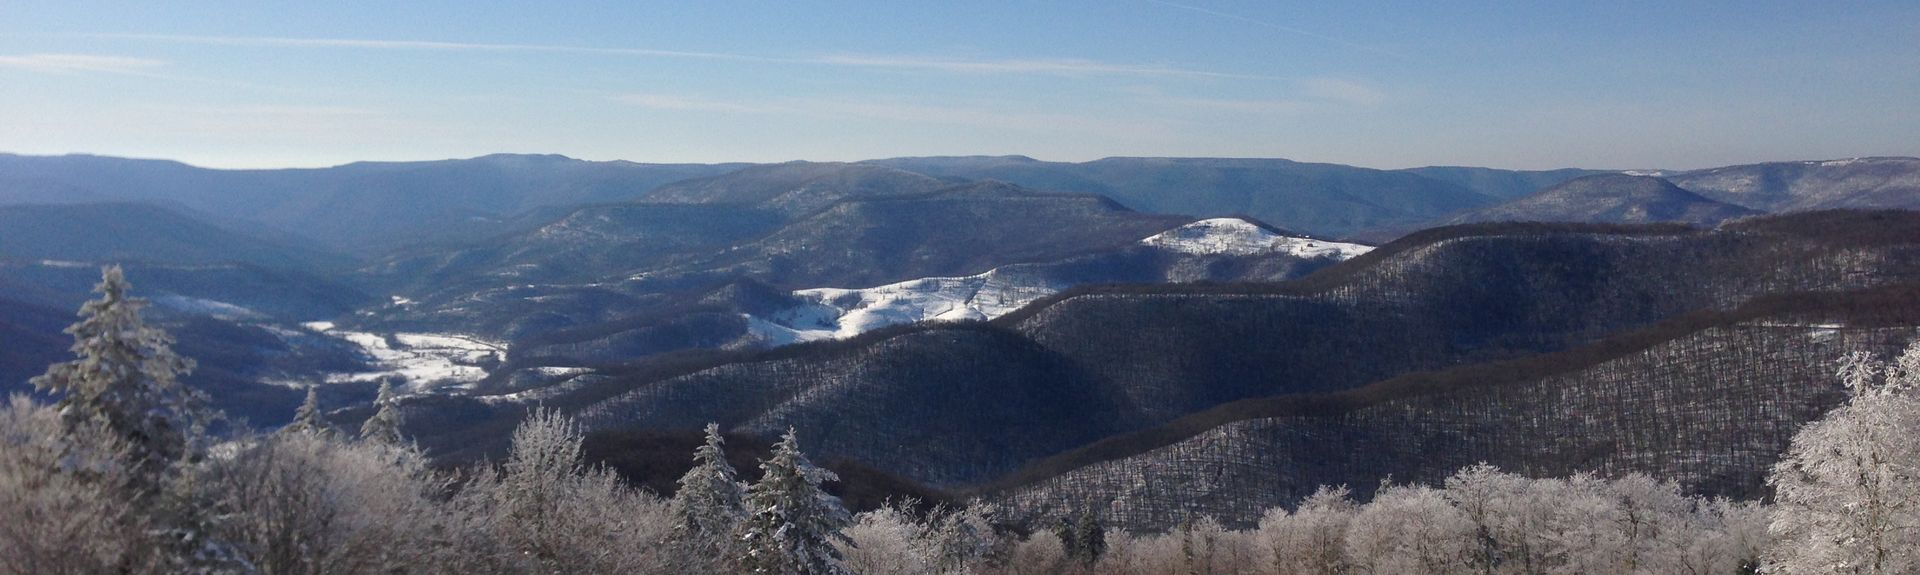 Soaring Eagle, Snowshoe, West Virginia, United States of America